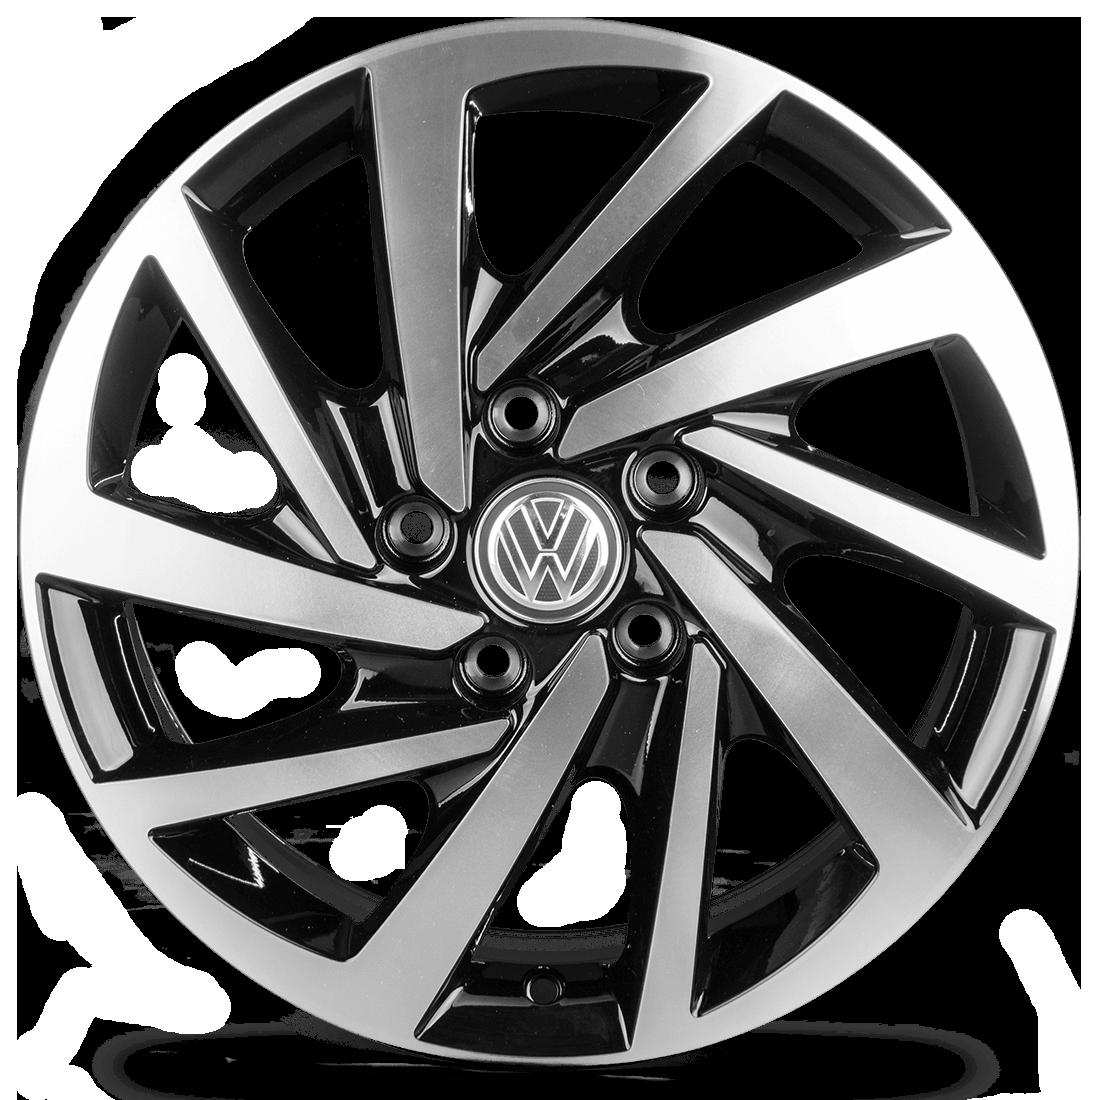 VW 17 Zoll Alufelgen T5 T6 Bus Multivan Caravelle Bulli Woodstock Rotor Felgen